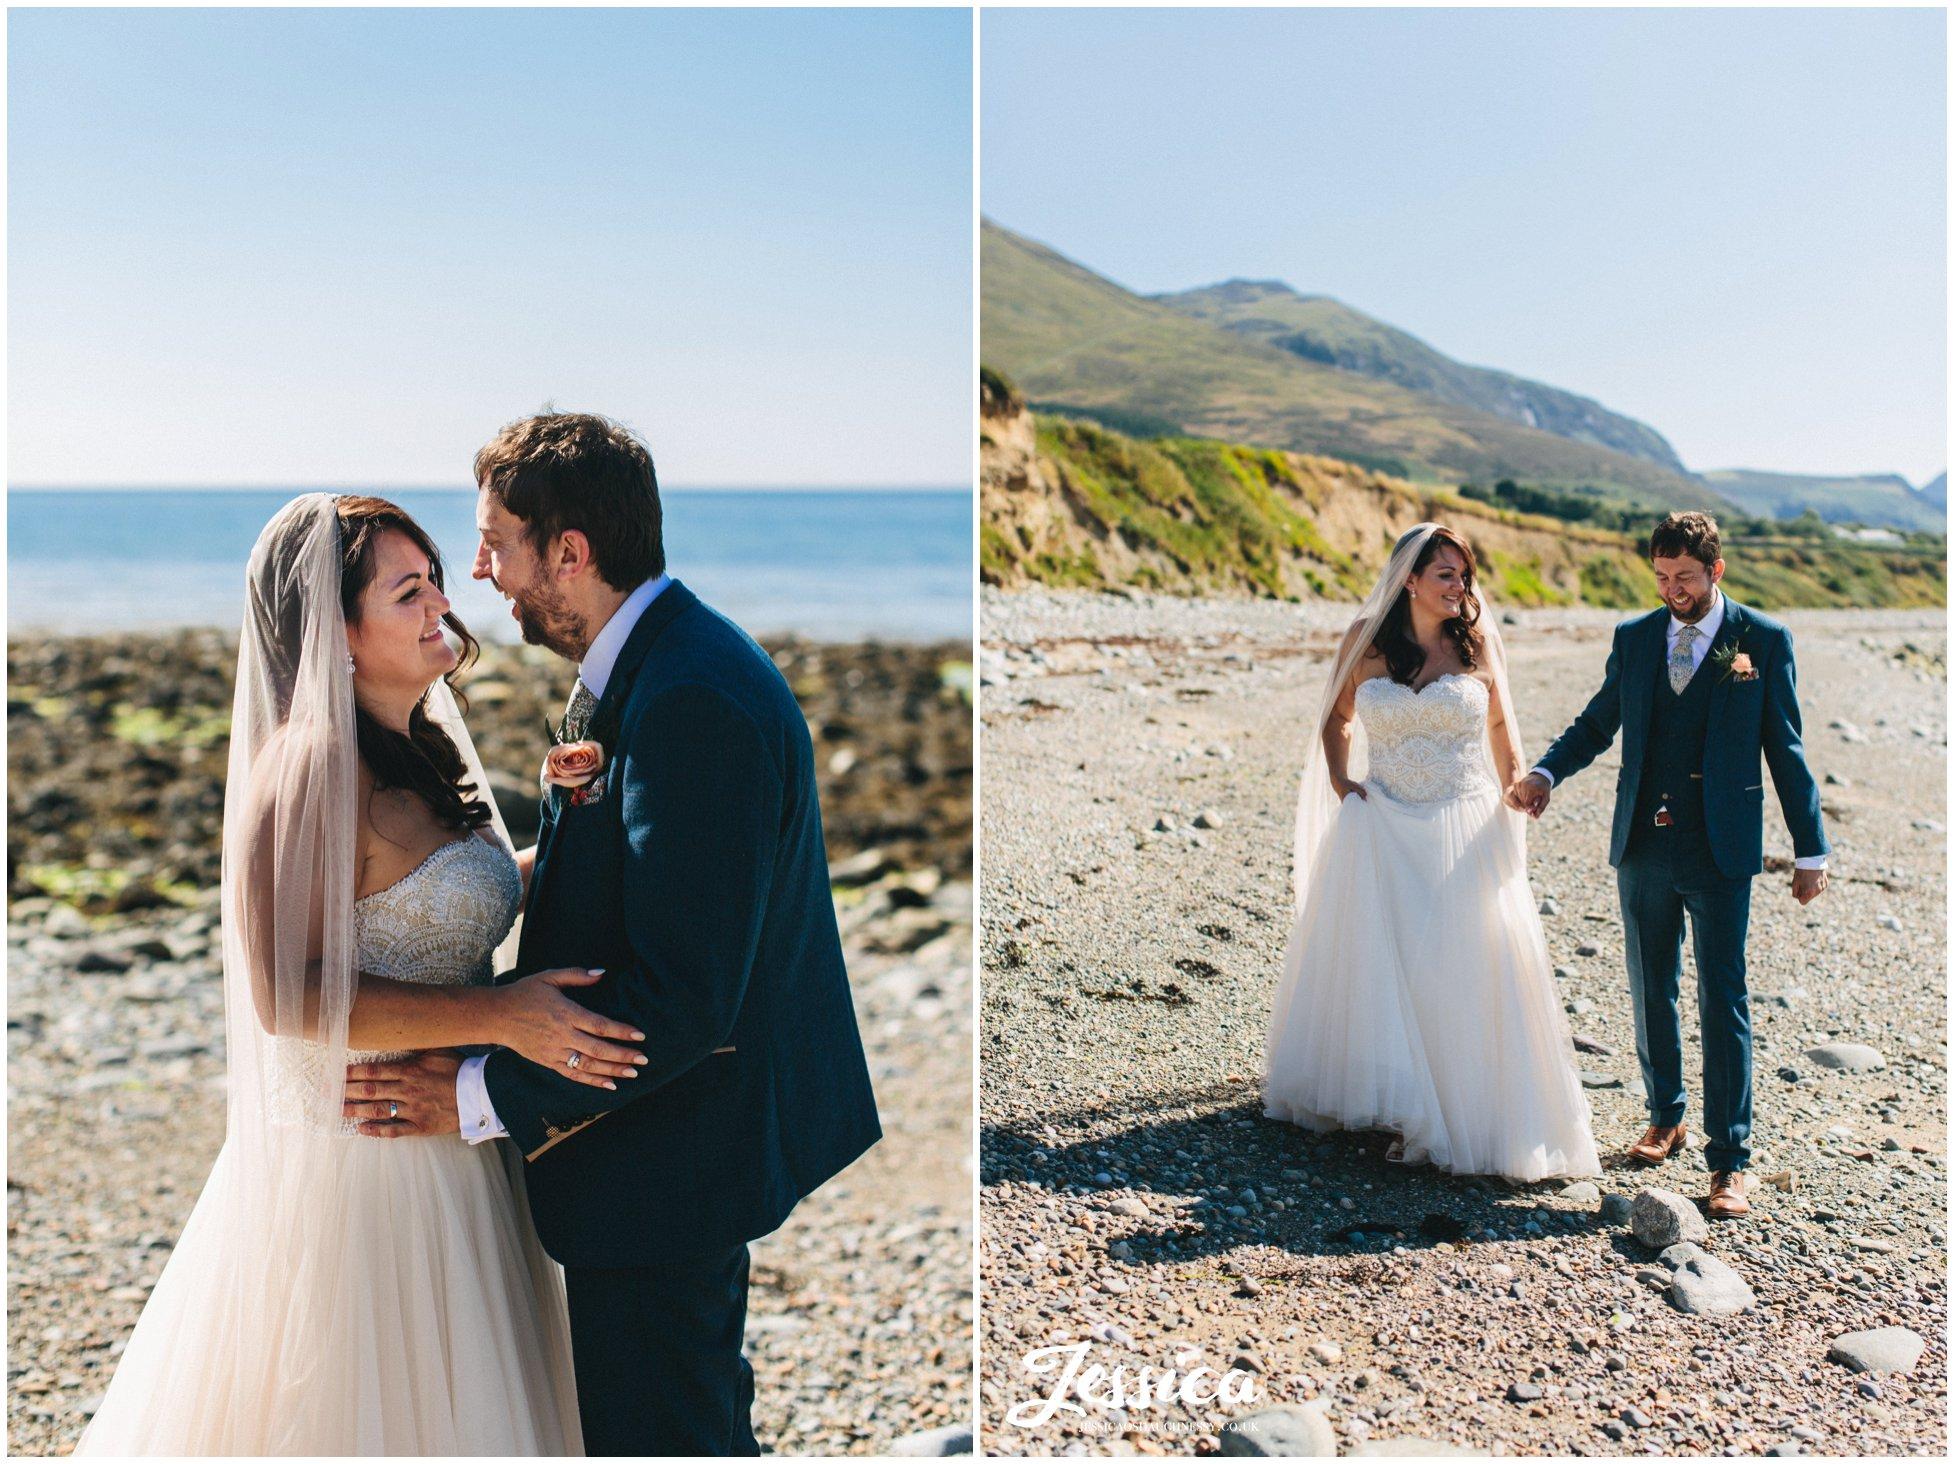 the couple enjoy the sun on Caernarfon bay at their bach wen wedding